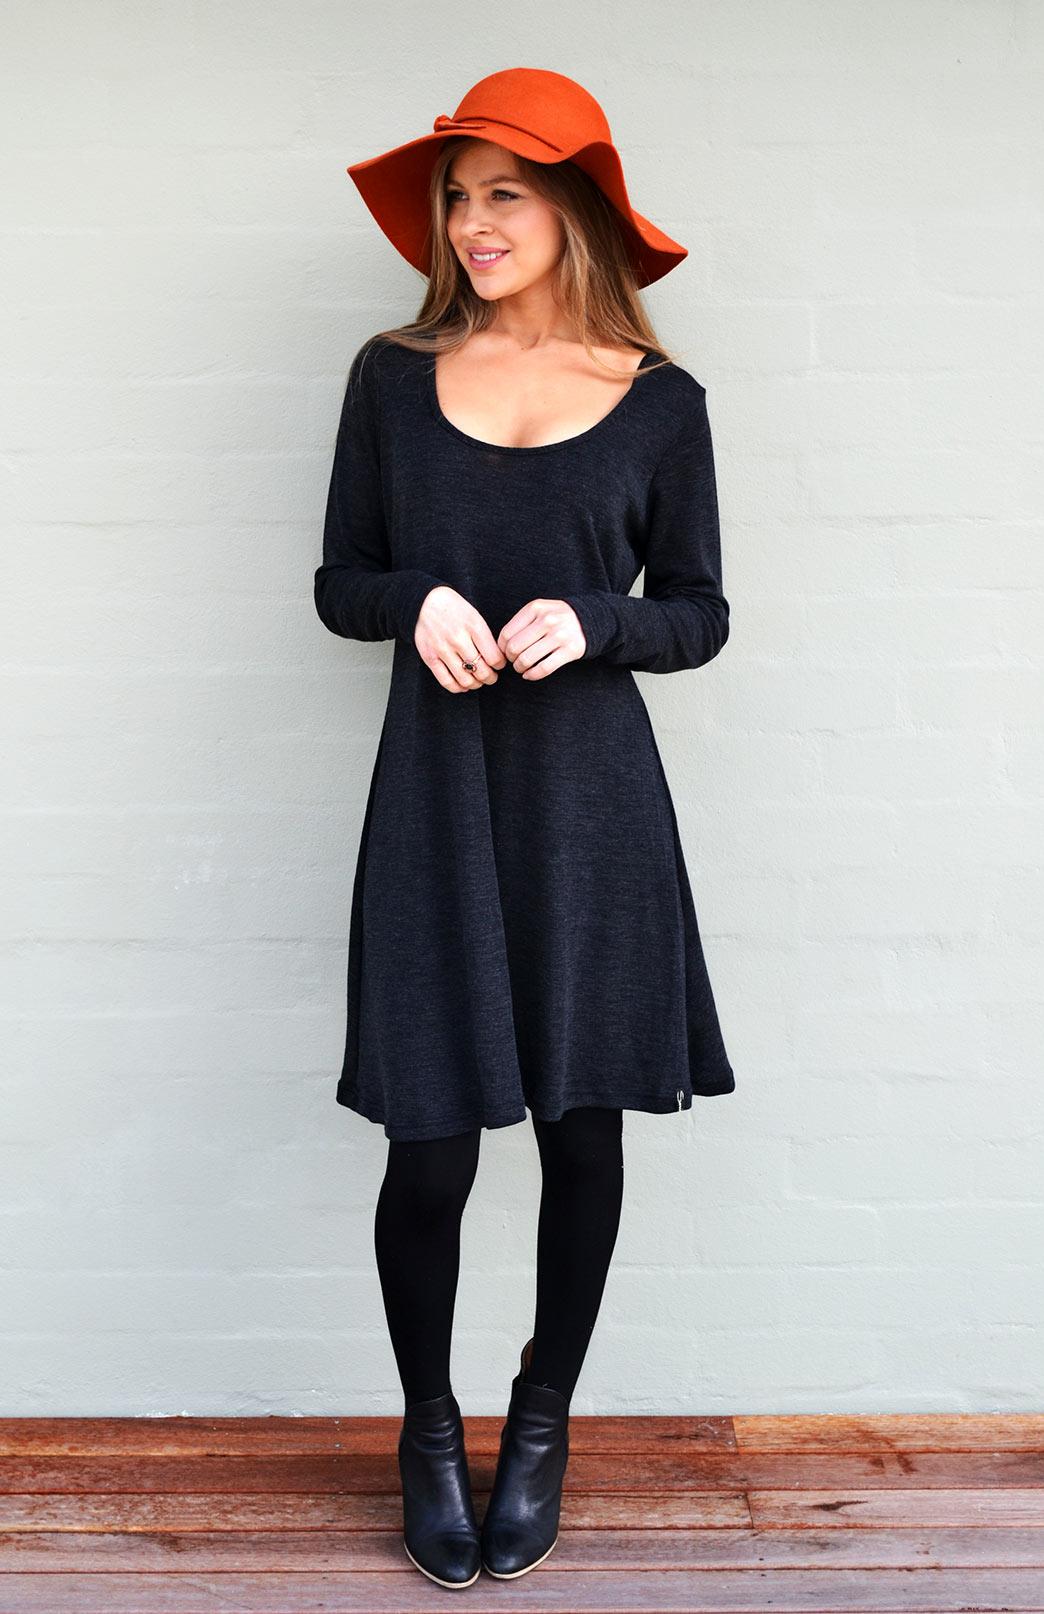 Rib Swing Dress - Women's Pull-On Black Long Sleeved Heavyweight Merino Wool Winter Dress - Smitten Merino Tasmania Australia